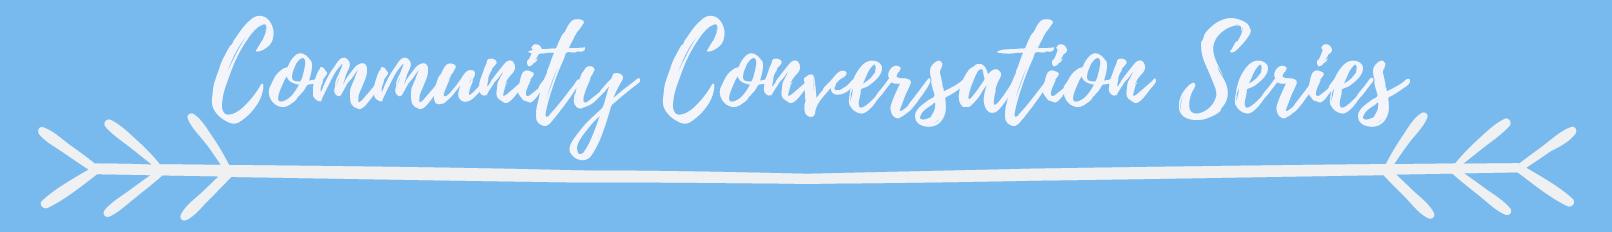 Community Conversations Series